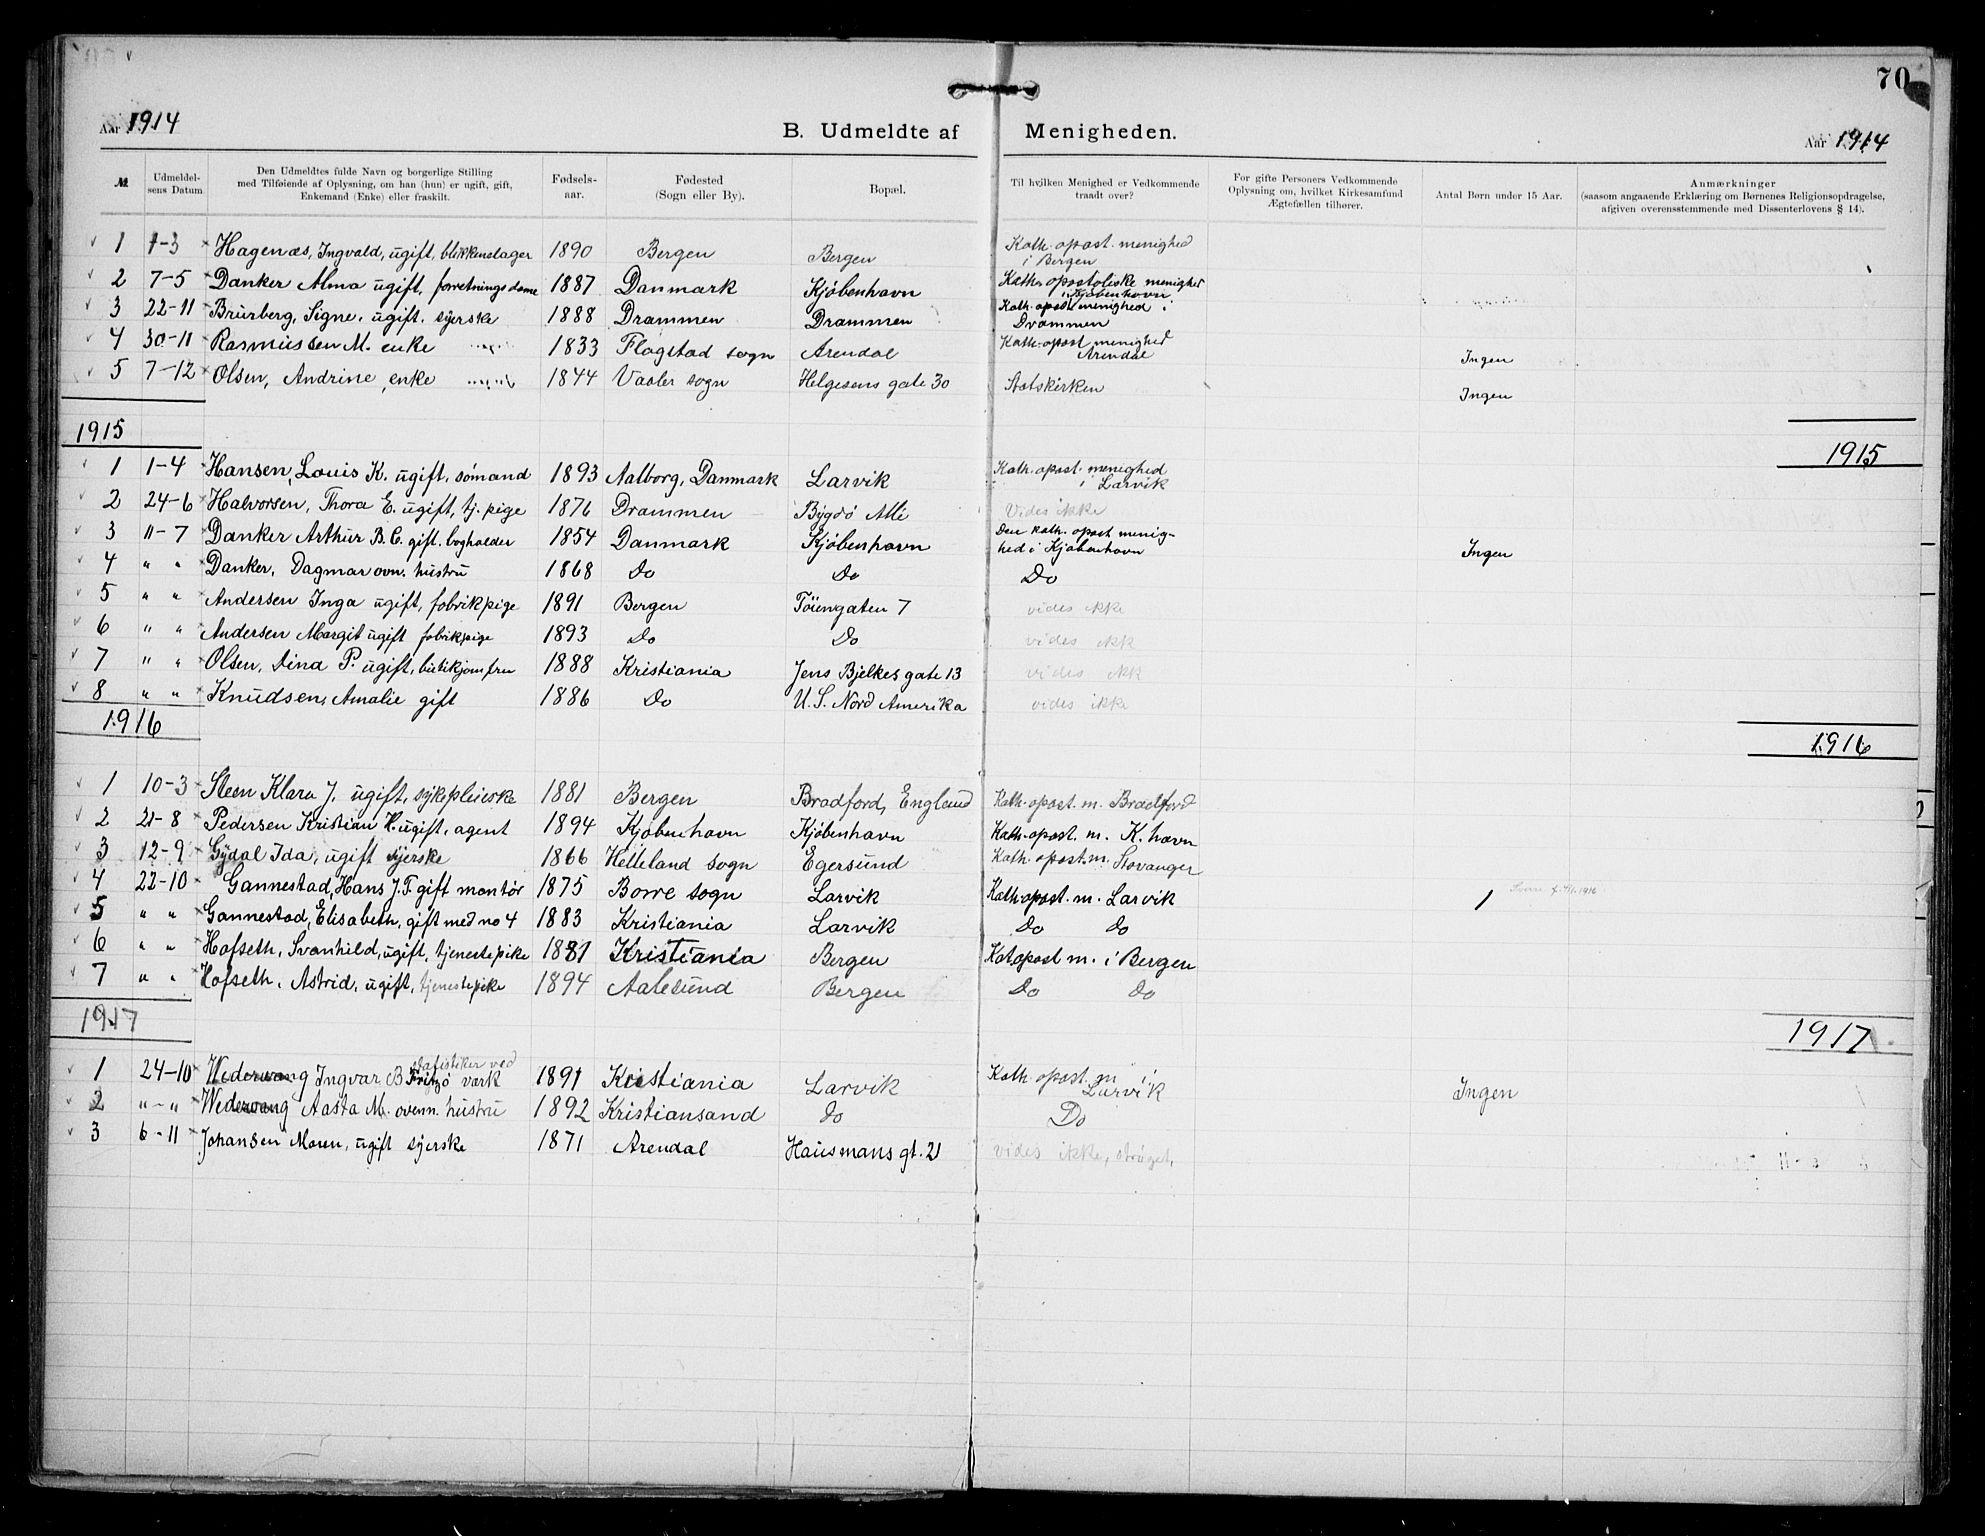 SAO, Den katolsk apostoliske menighet i Oslo , F/Fa/L0002: Dissenterprotokoll nr. 2, 1892-1937, s. 70